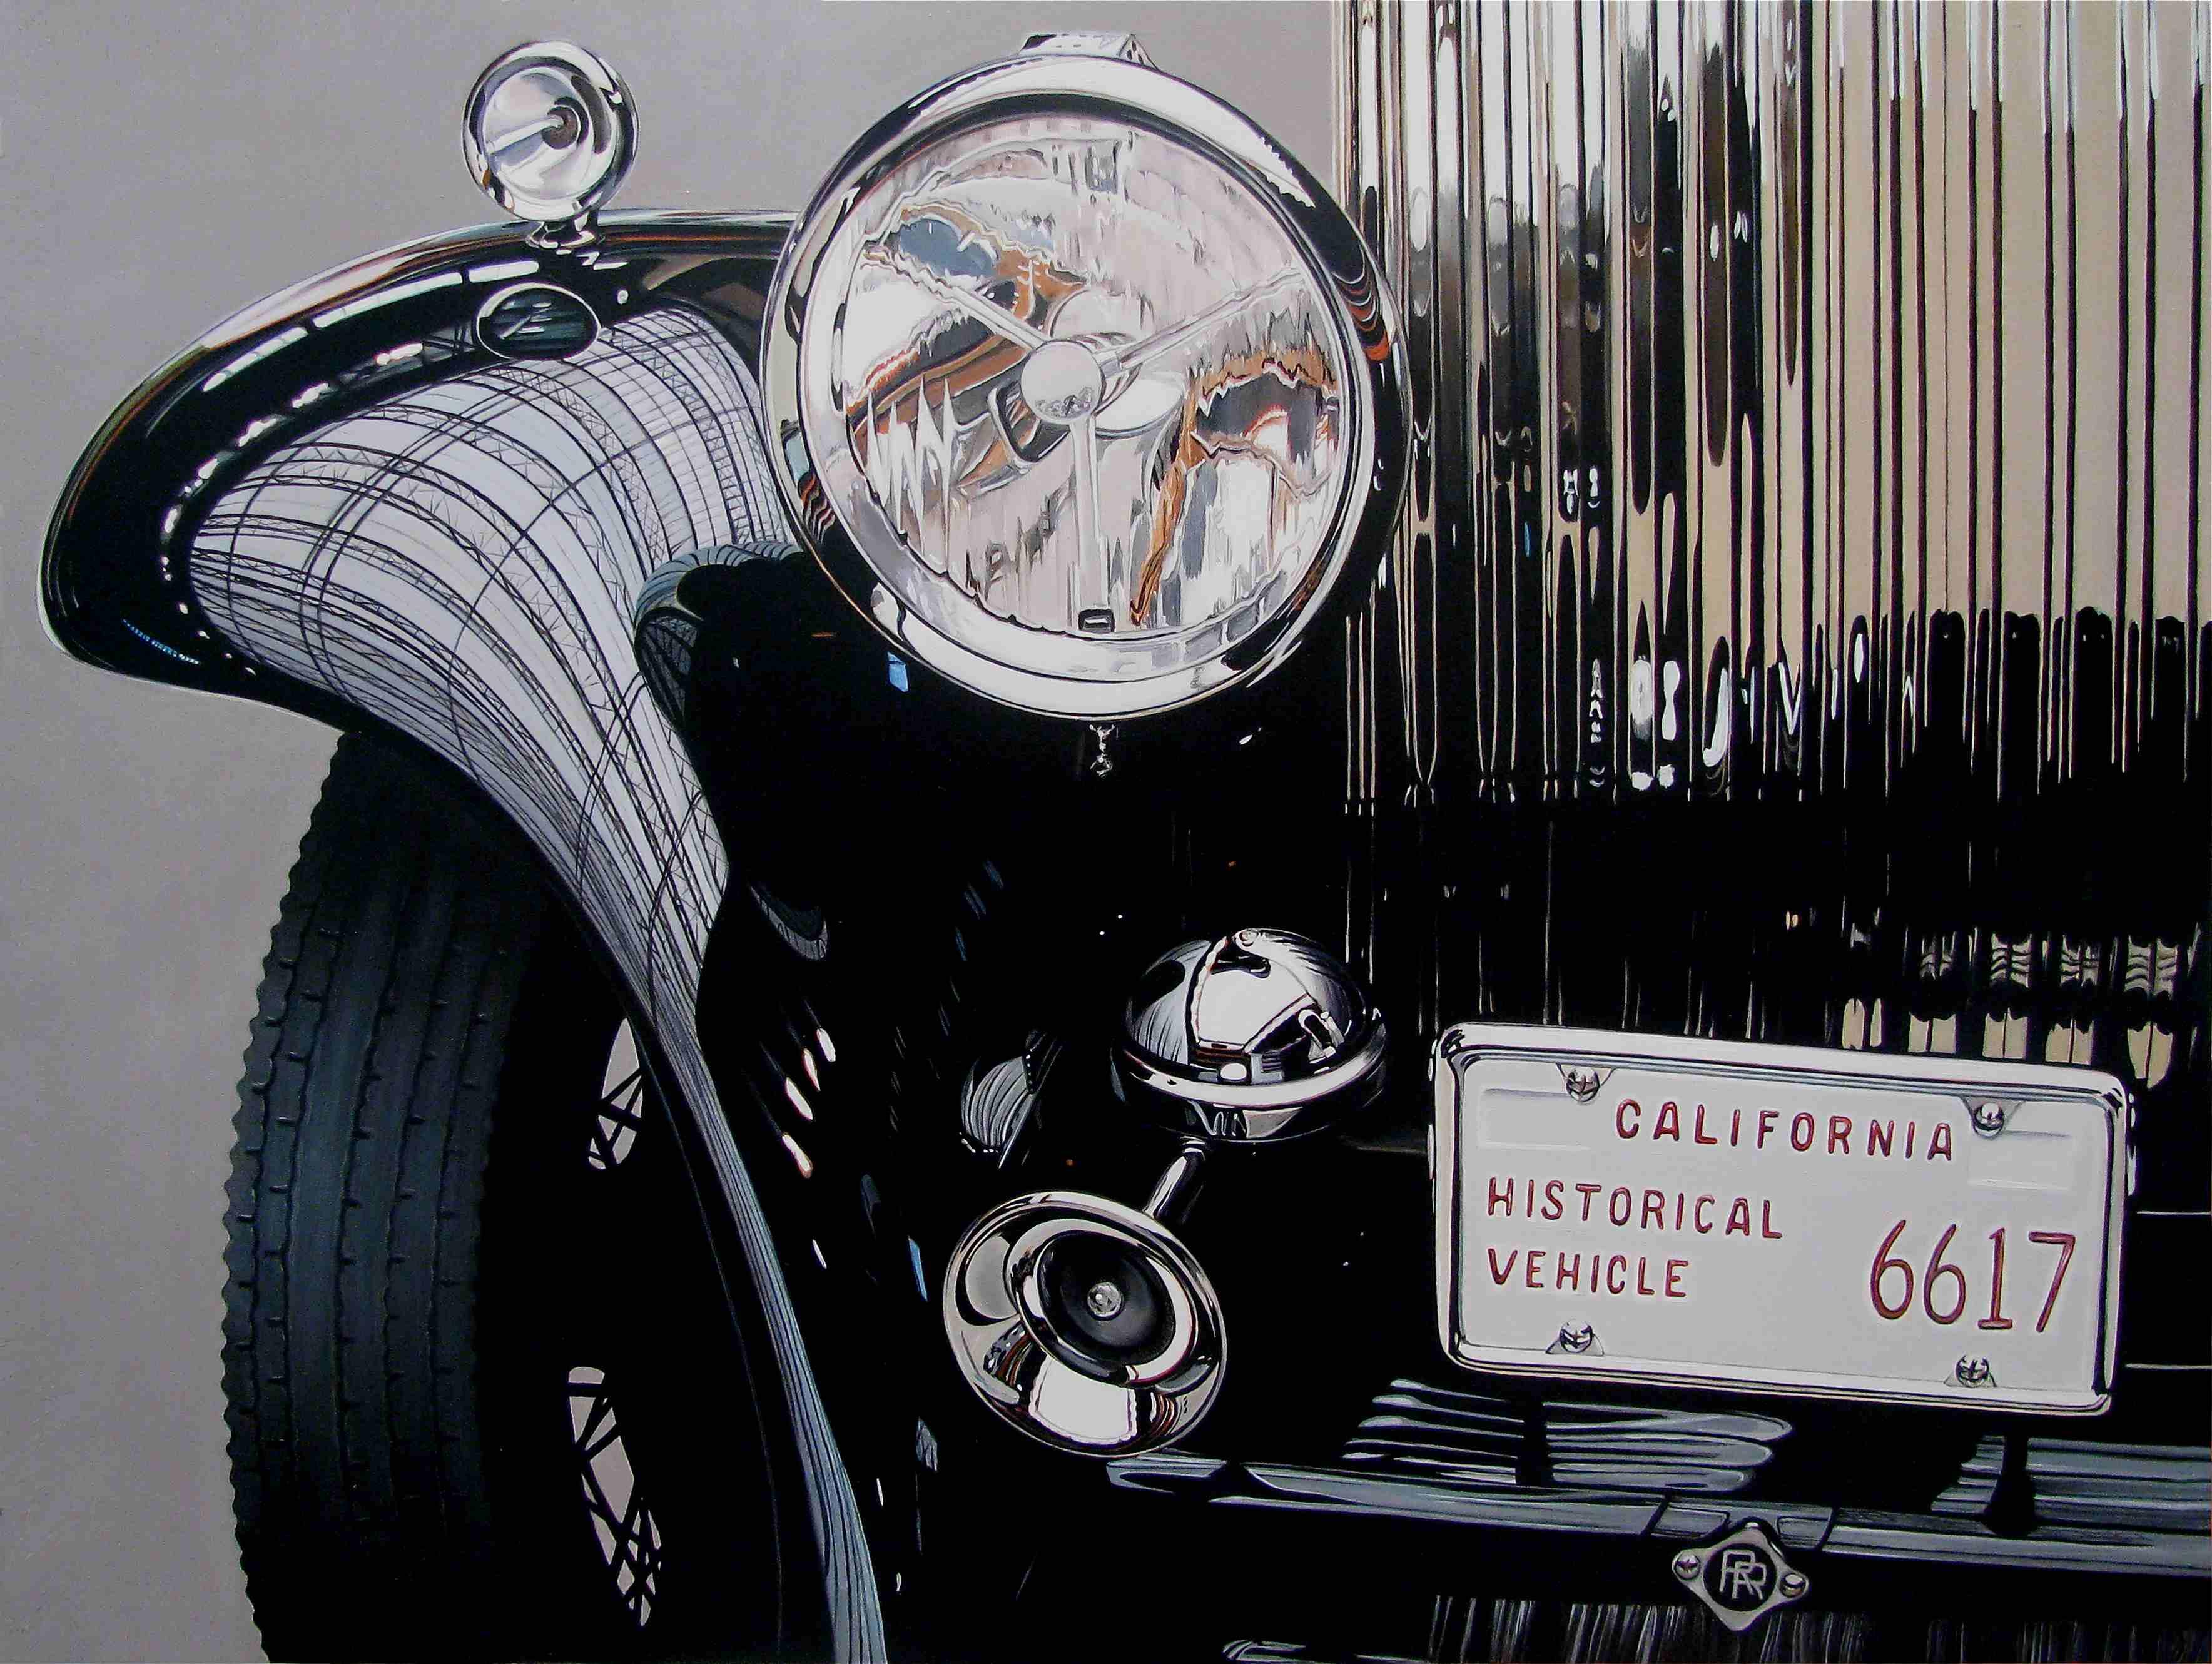 vintage-Rolls-Royce-18-x-24